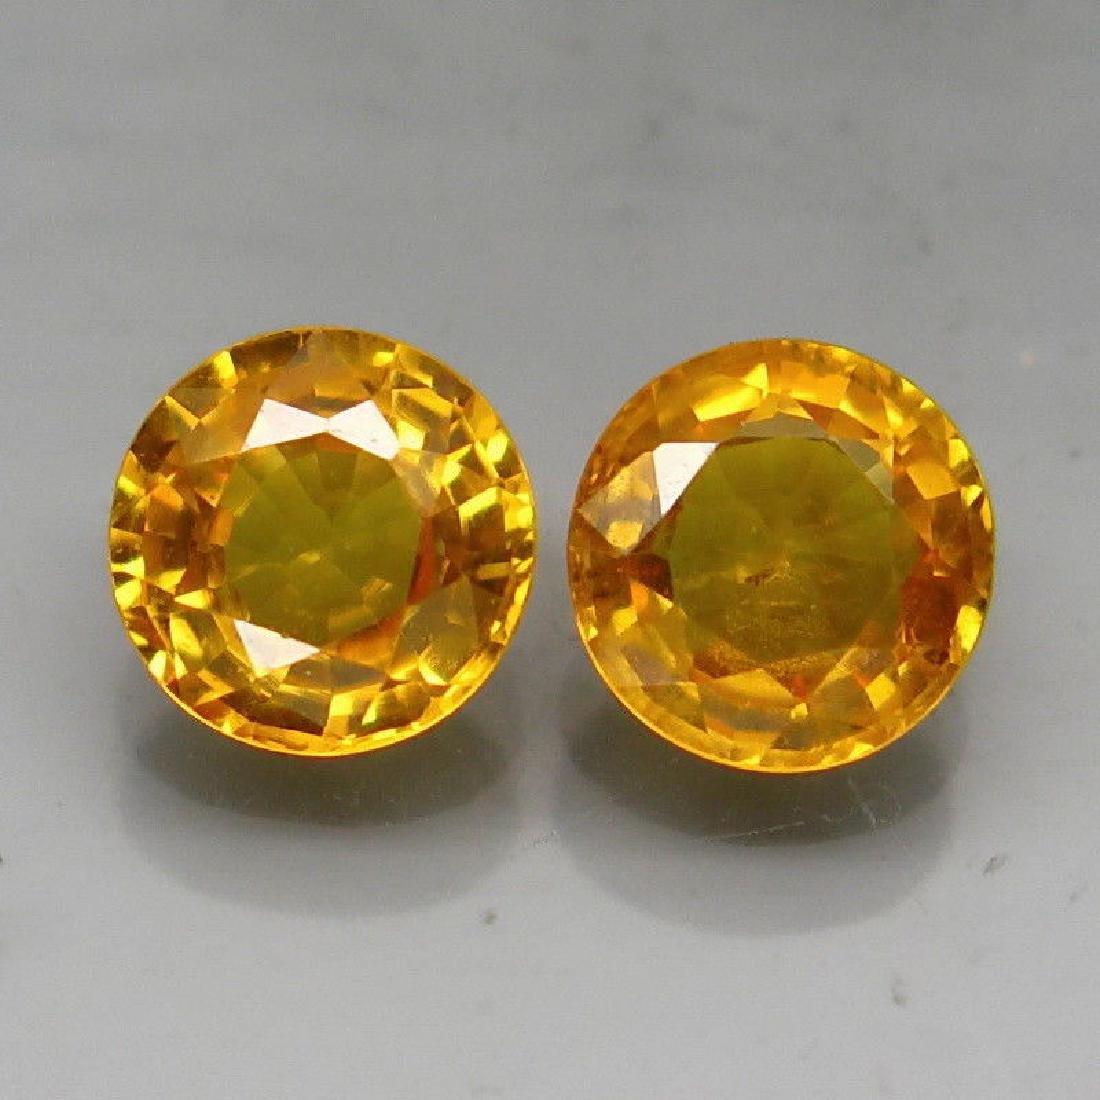 Natural Yellow Sapphire Pair 5.1 MM